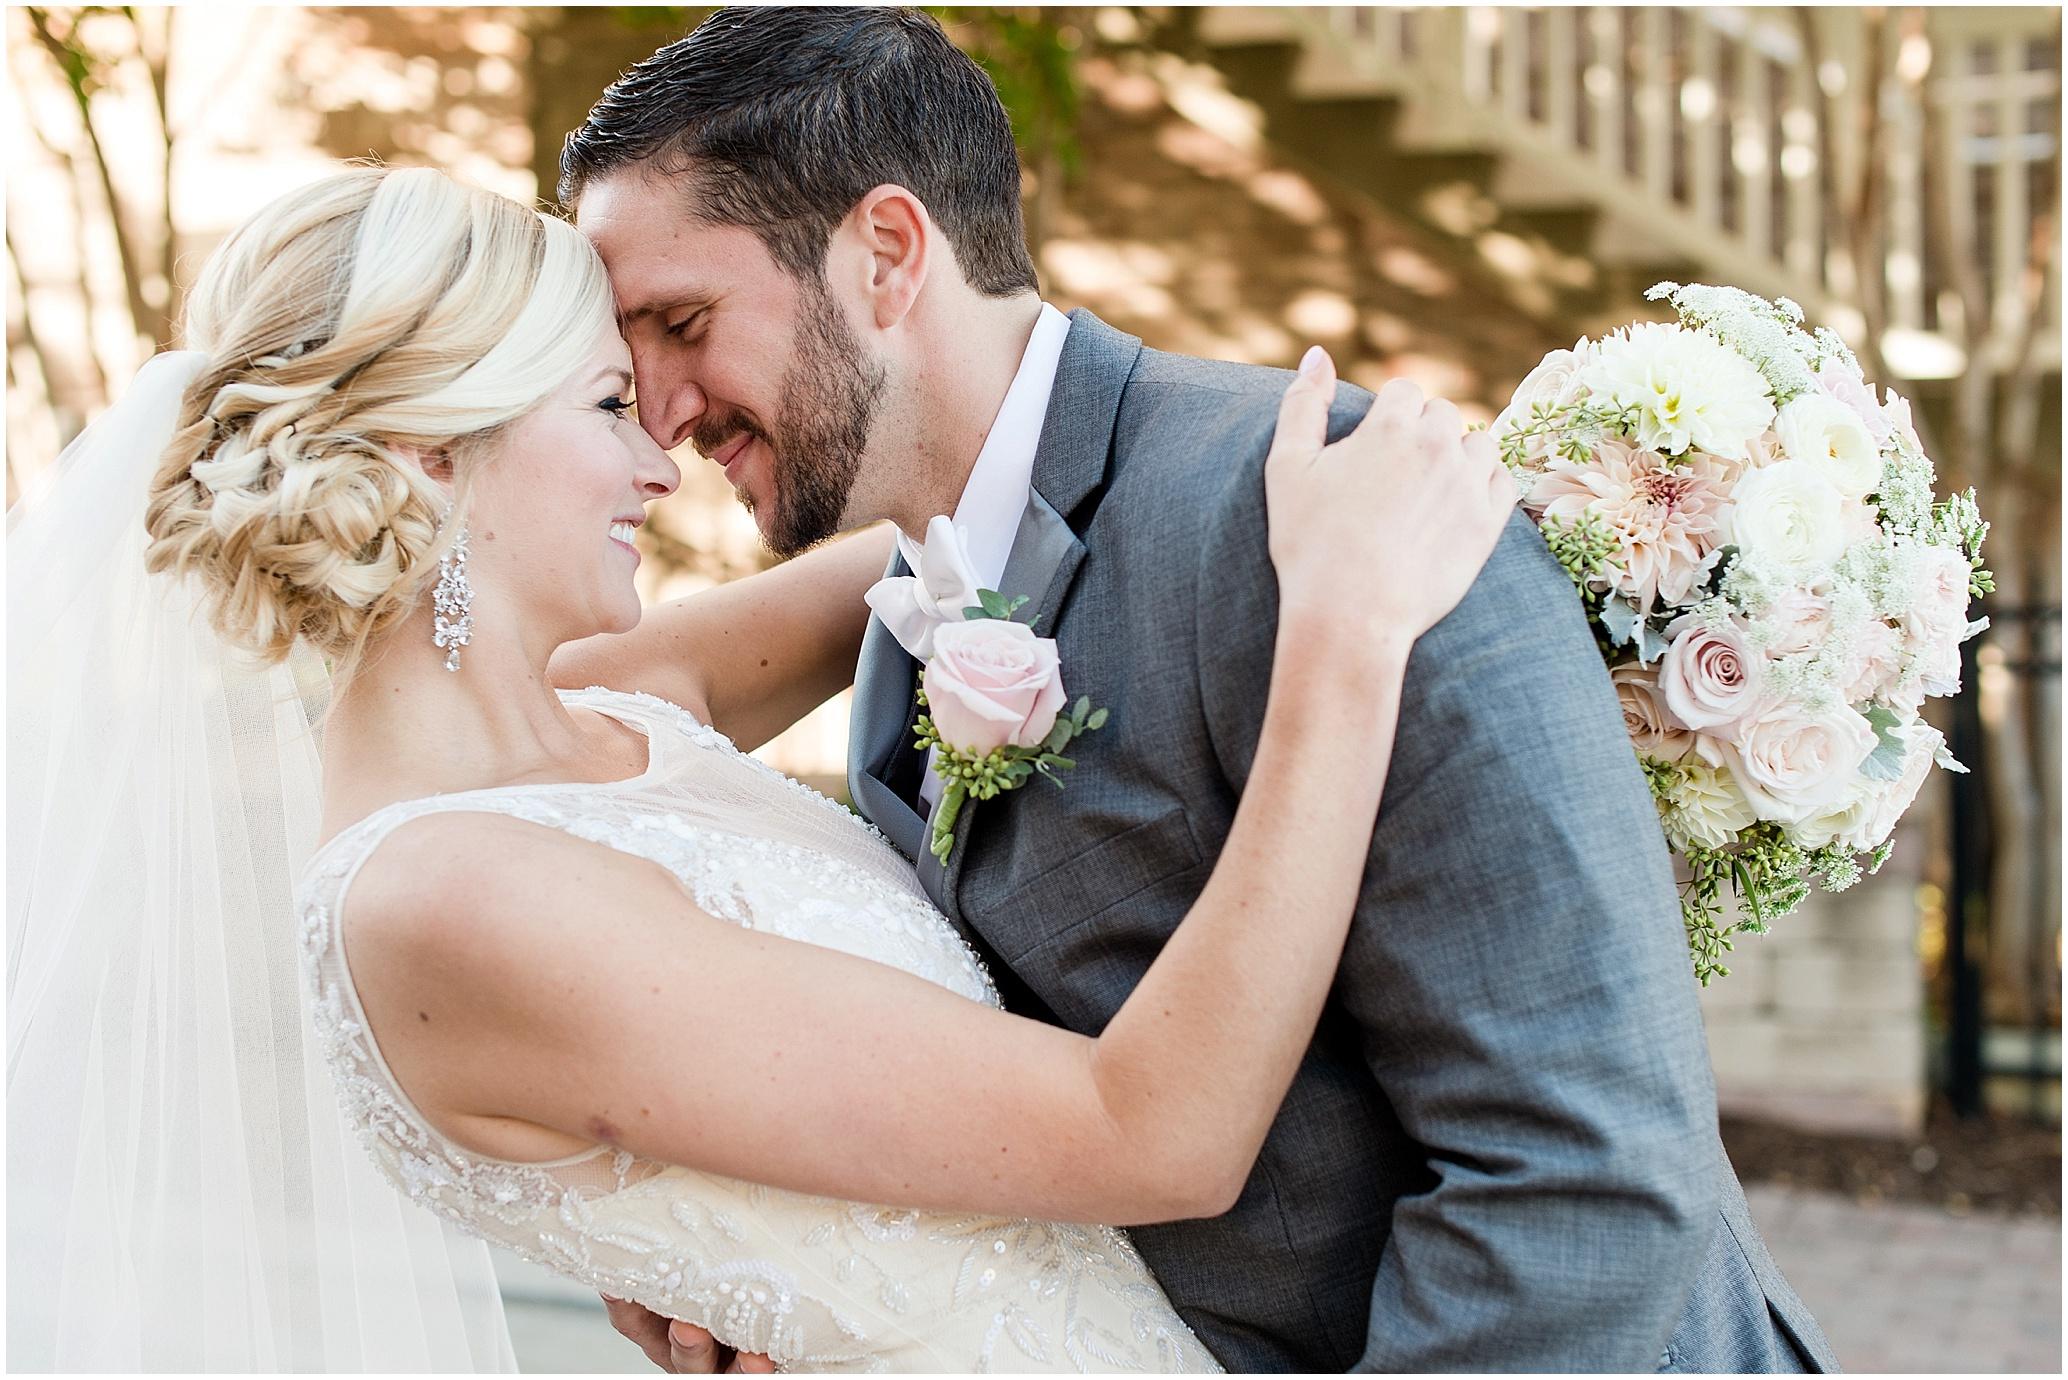 Hannah Leigh Photography Tabrizis Baltimore Wedding_2223.jpg